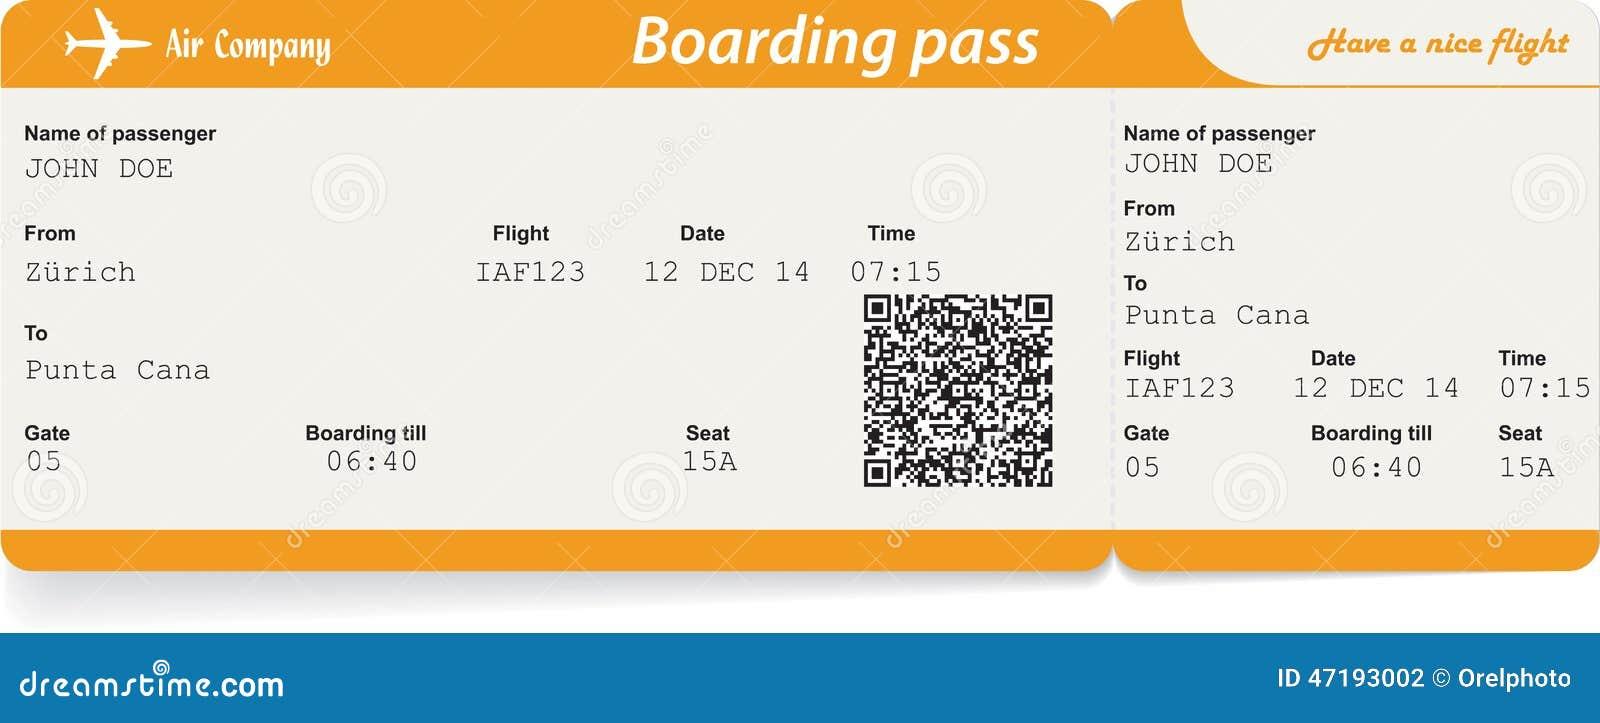 Spirit Air Travel Agent